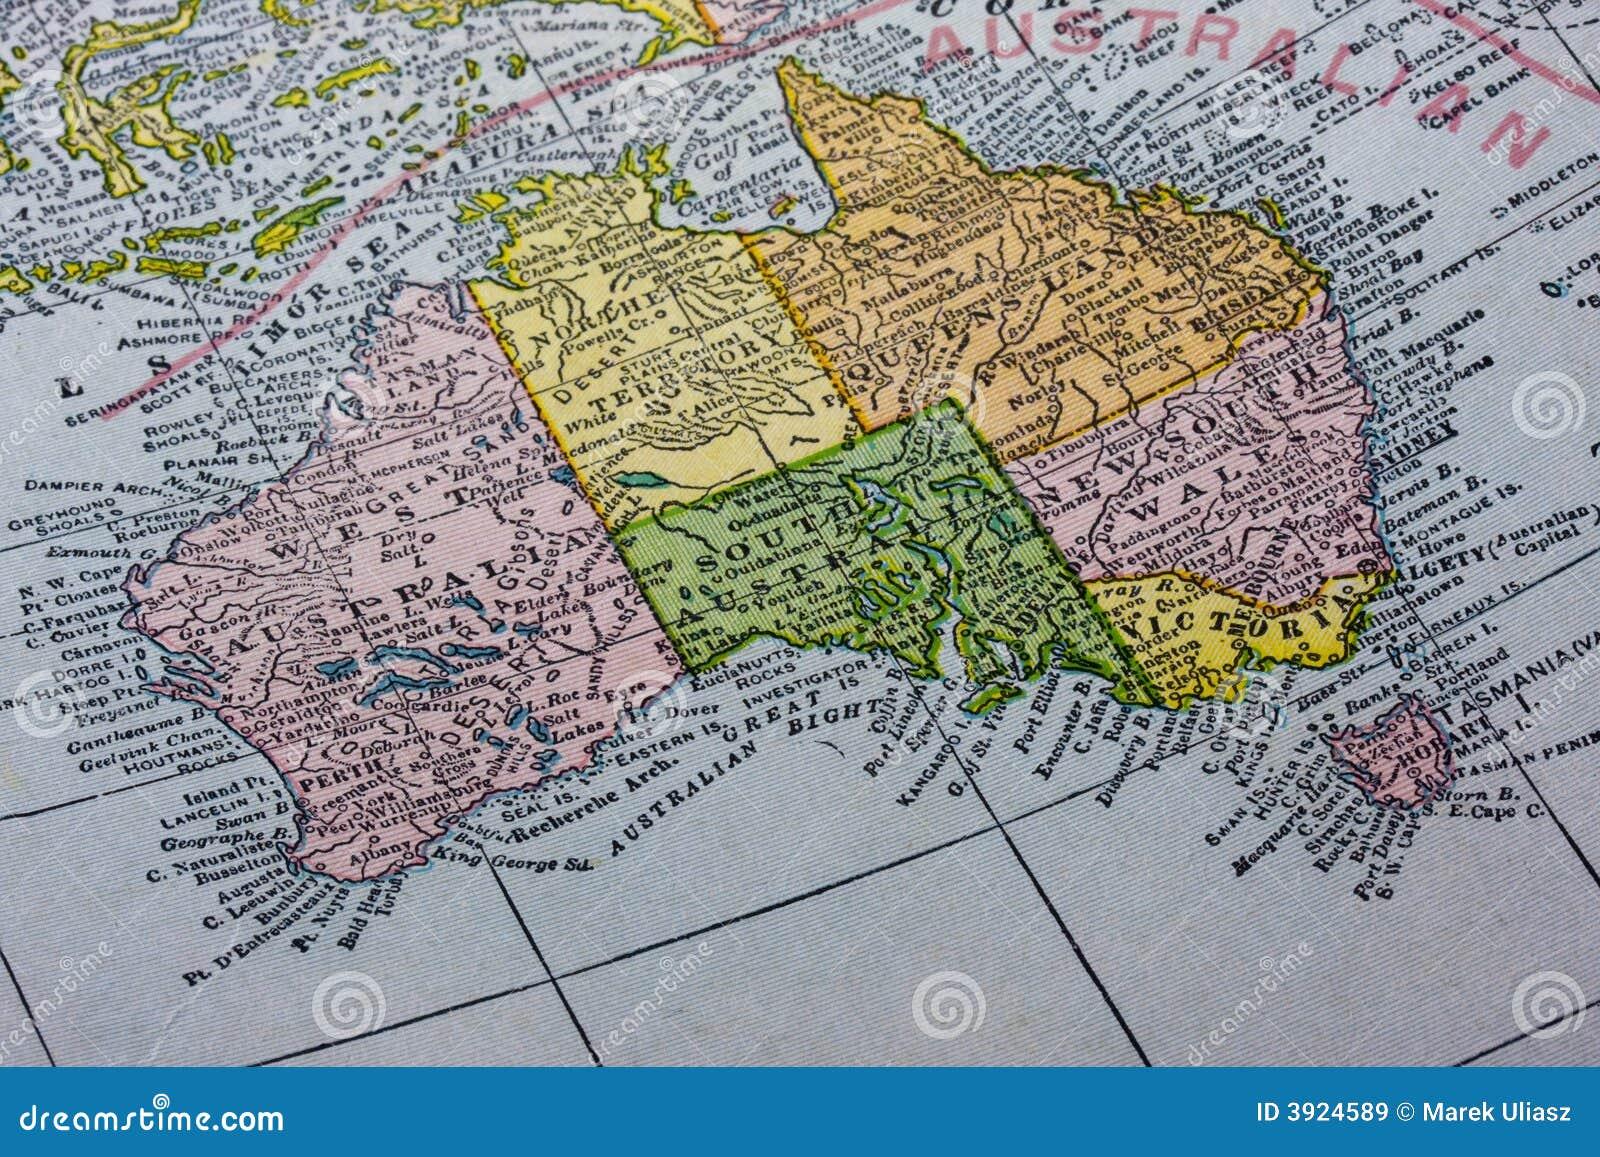 Map Of Australia And Tasmania.Australia With Tasmania Map Stock Image Image Of Australia